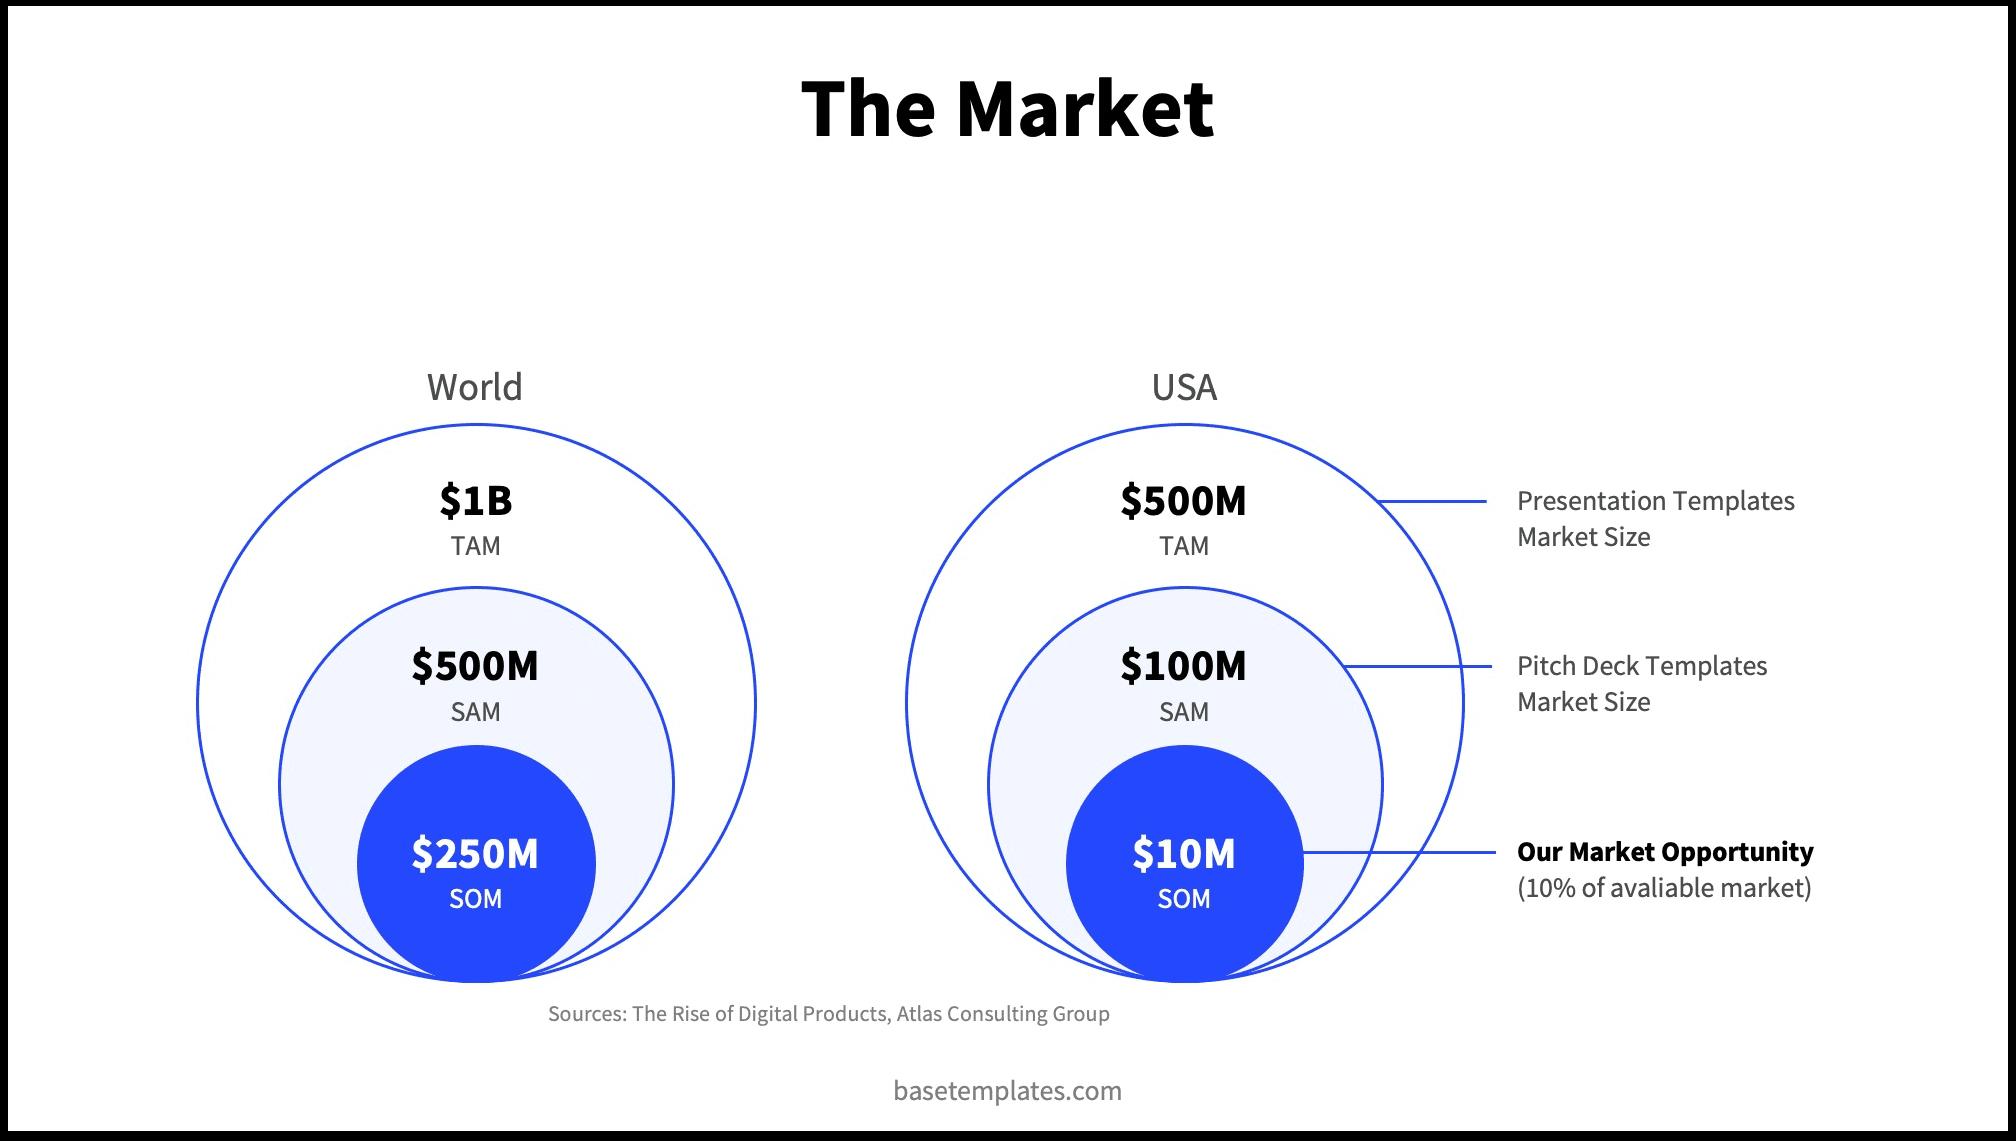 Classical market slide design with venn diagram style